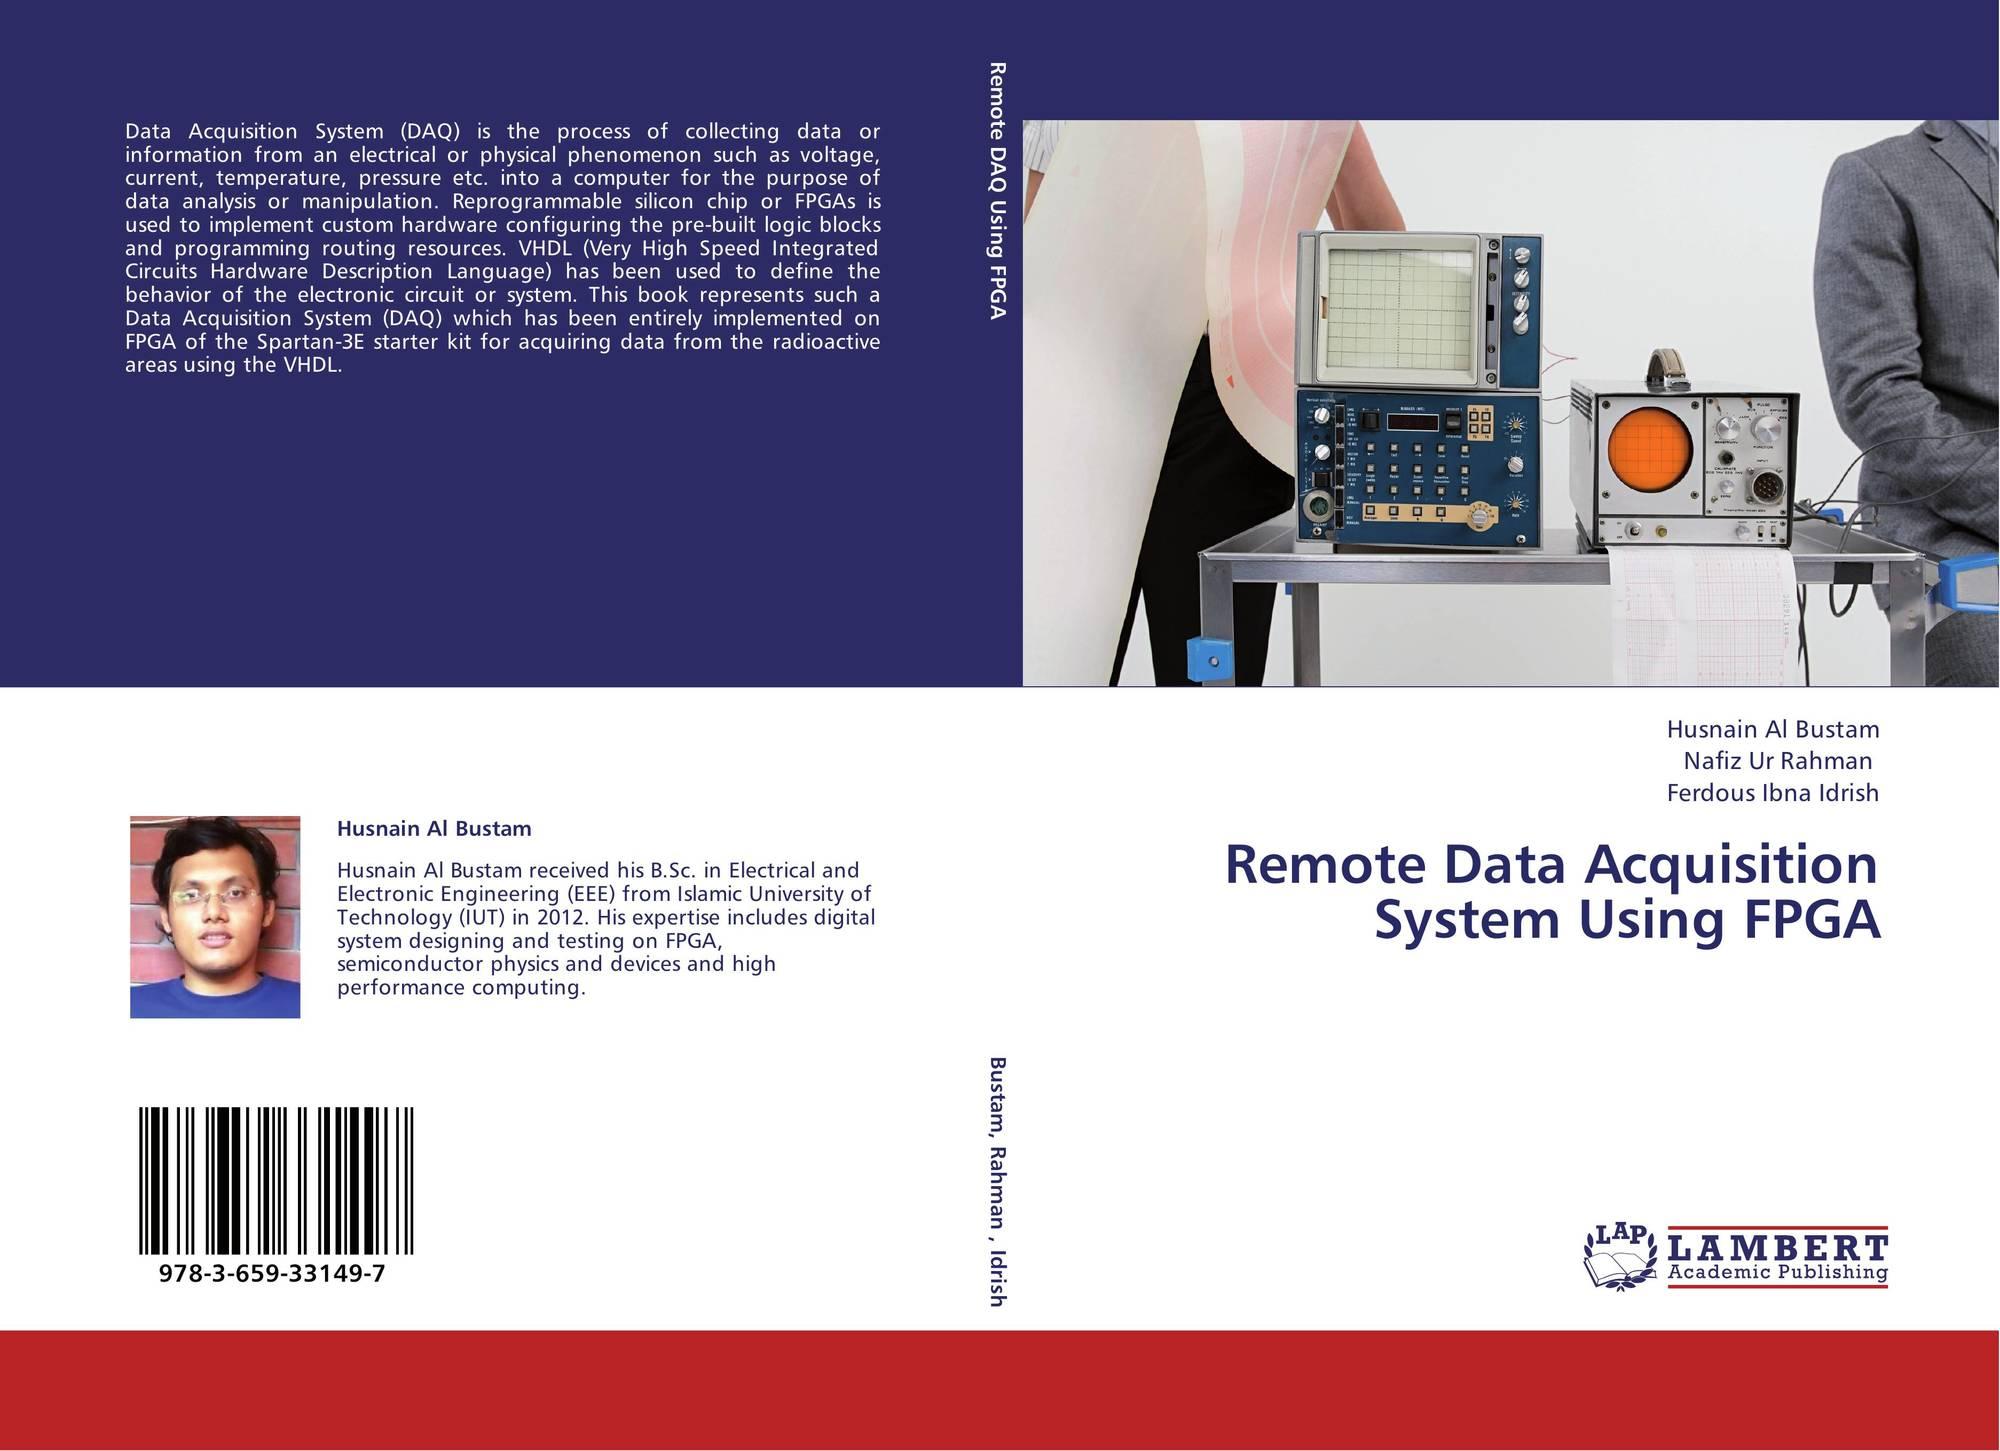 Remote Data Acquisition System Using Fpga 978 3 659 33149 7 365933149x 9783659331497 By Husnain Al Bustam Nafiz Ur Rahman Ferdous Ibna Idrish